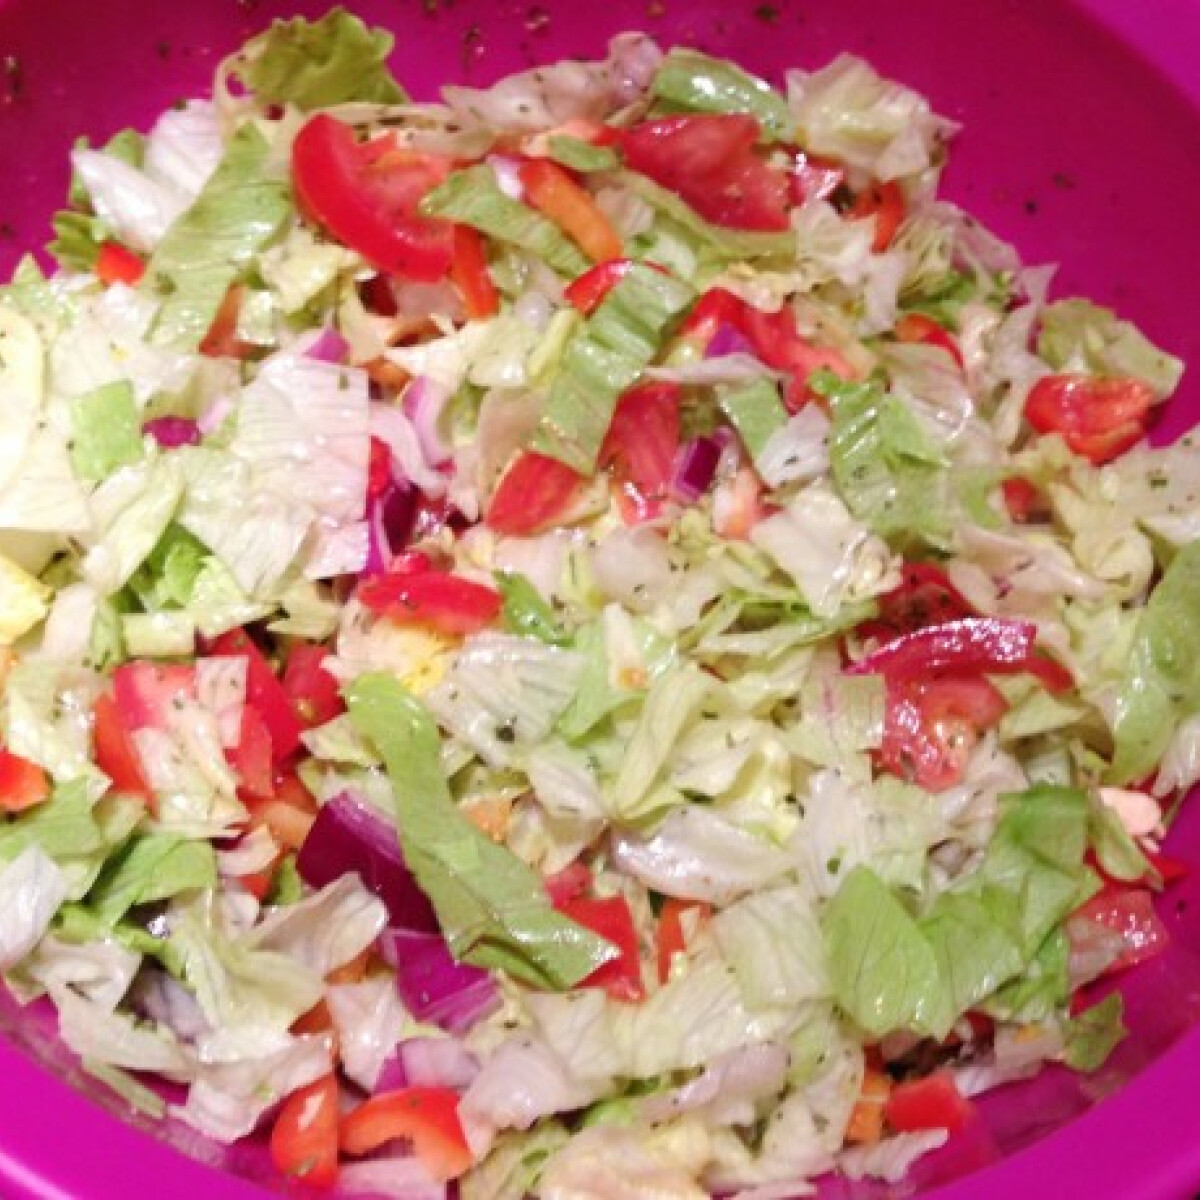 Roppanós salátakeverék